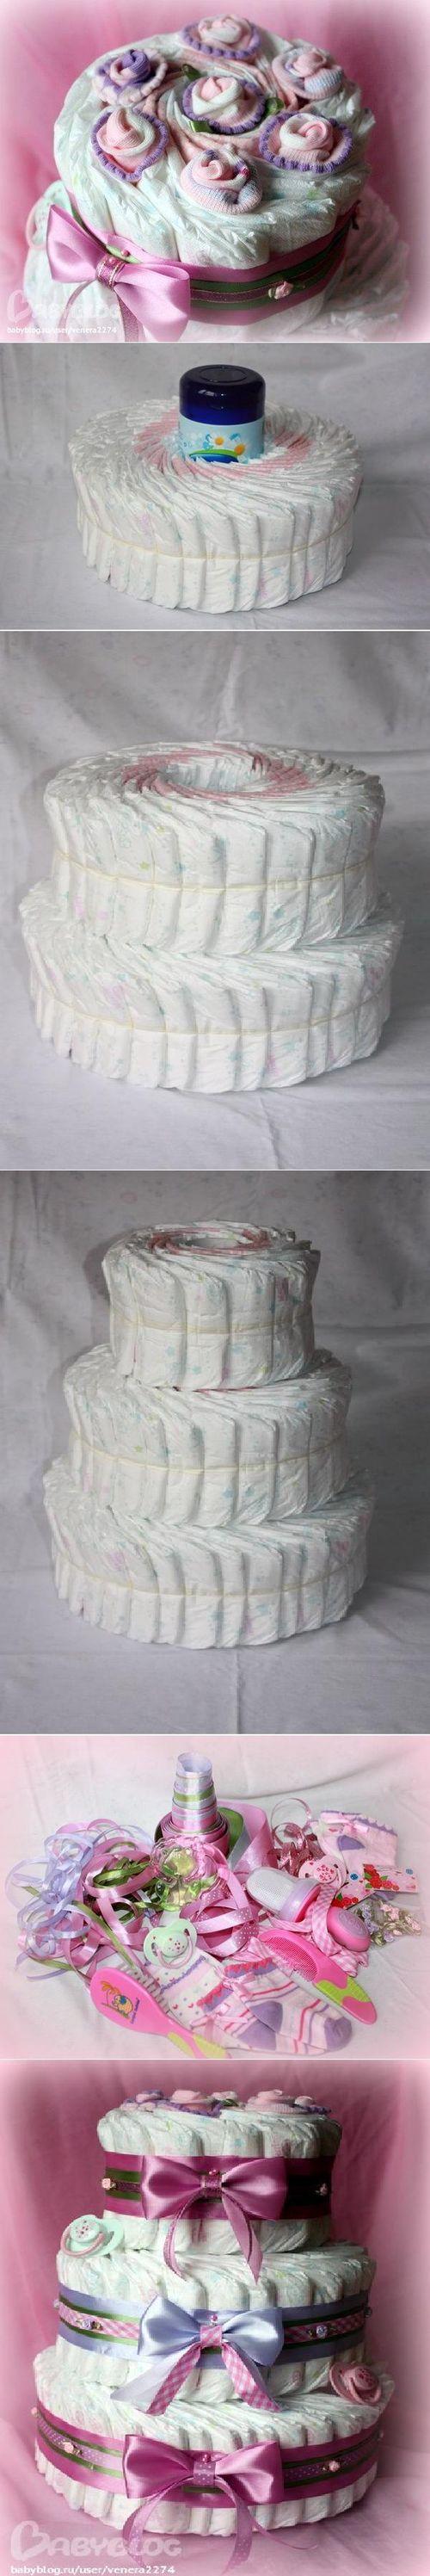 DIY Newborn Diaper Cake DIY Projects / UsefulDIY.com